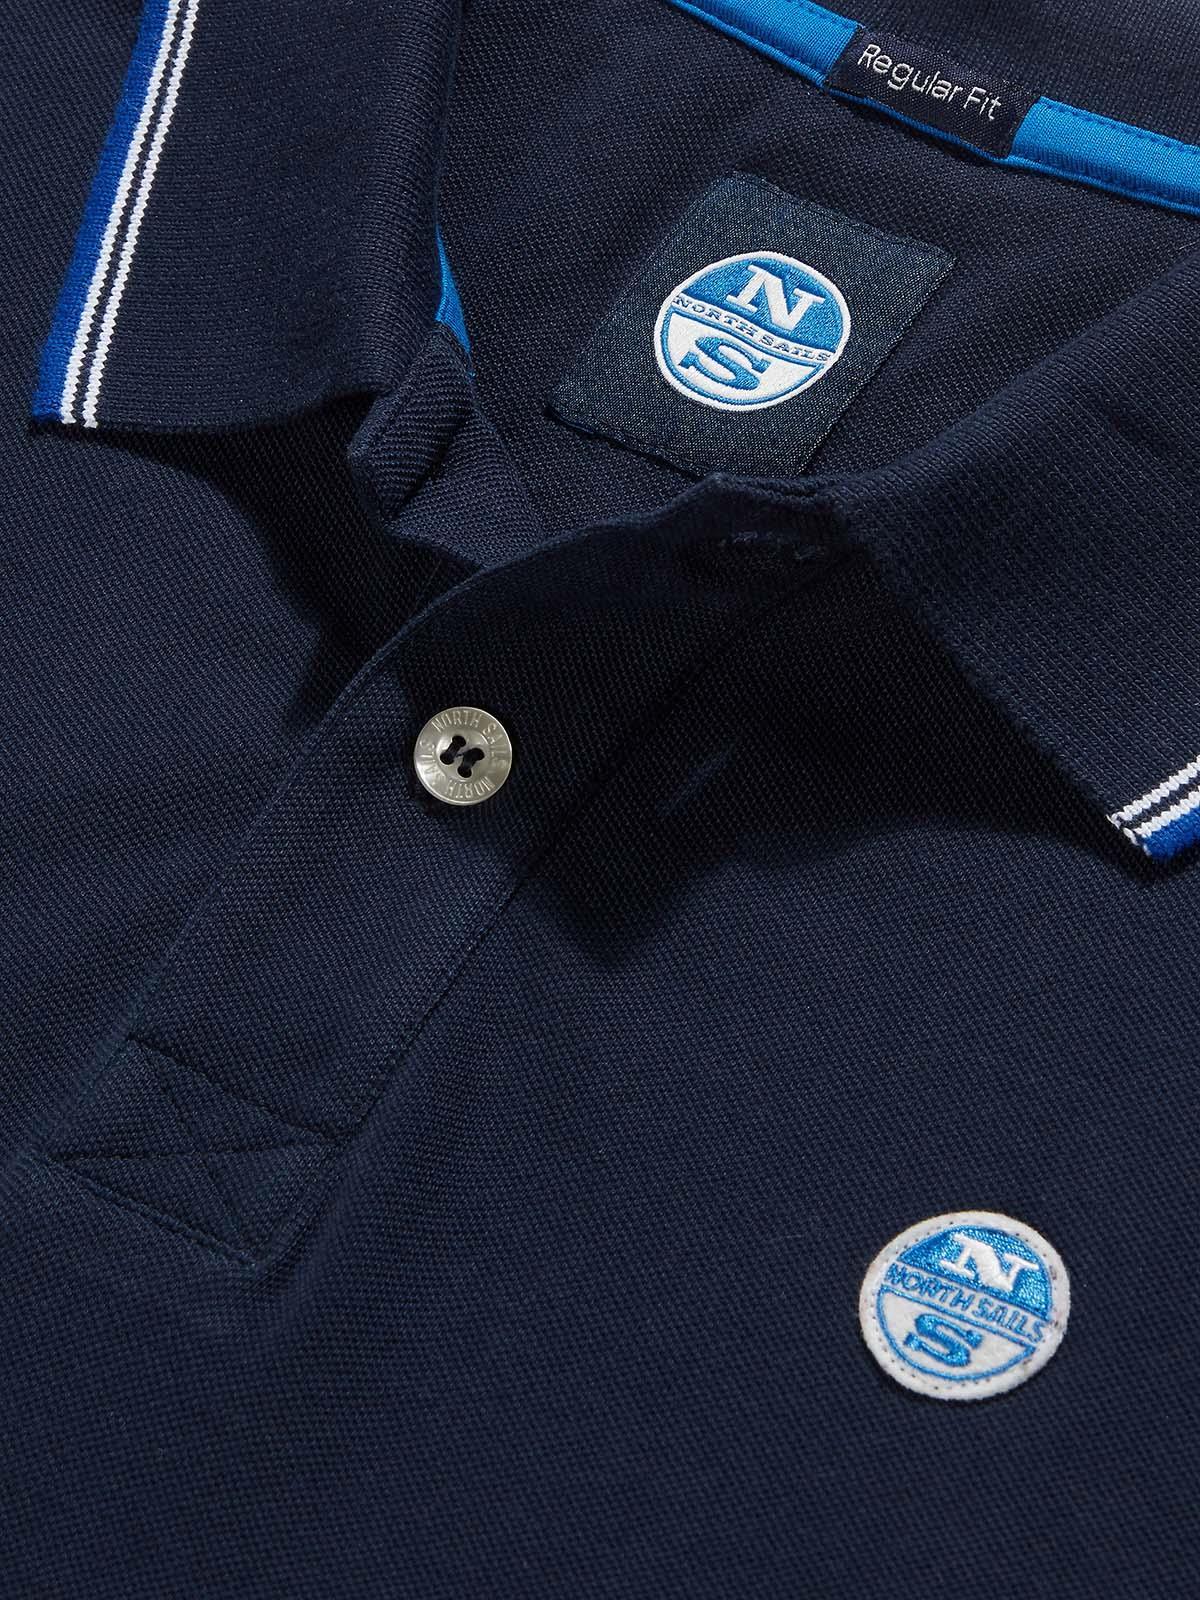 NEW-North-Sails-Legacy-Heritage-Mens-Cotton-Polo-Shirt-Top-Size-S-M-L-XL-XXL-3XL thumbnail 39